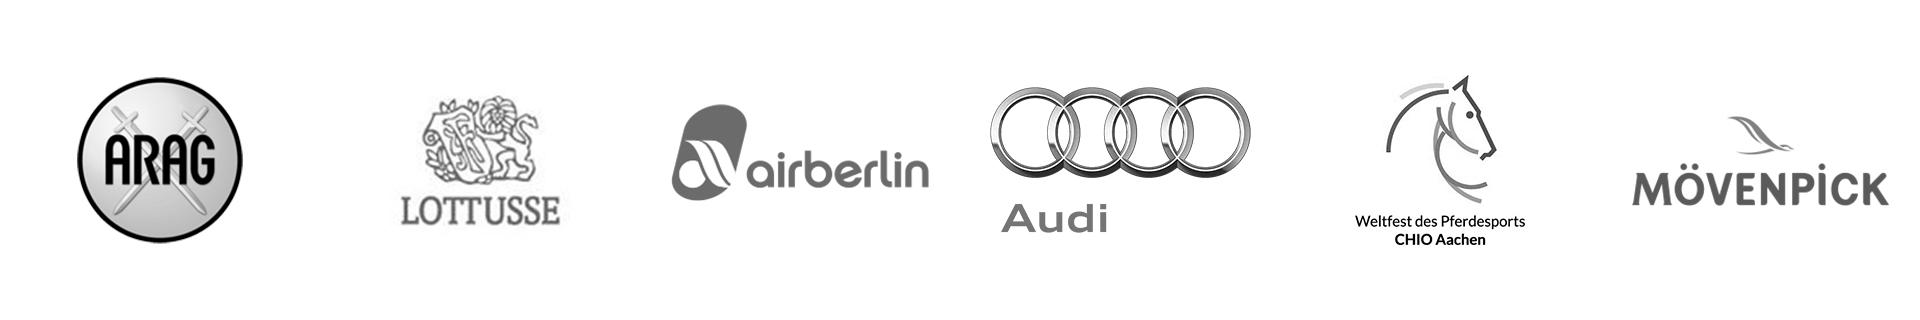 ARAG, LOTUSSE, air berlin, Audi, CHIO Aachen, Mövenpick